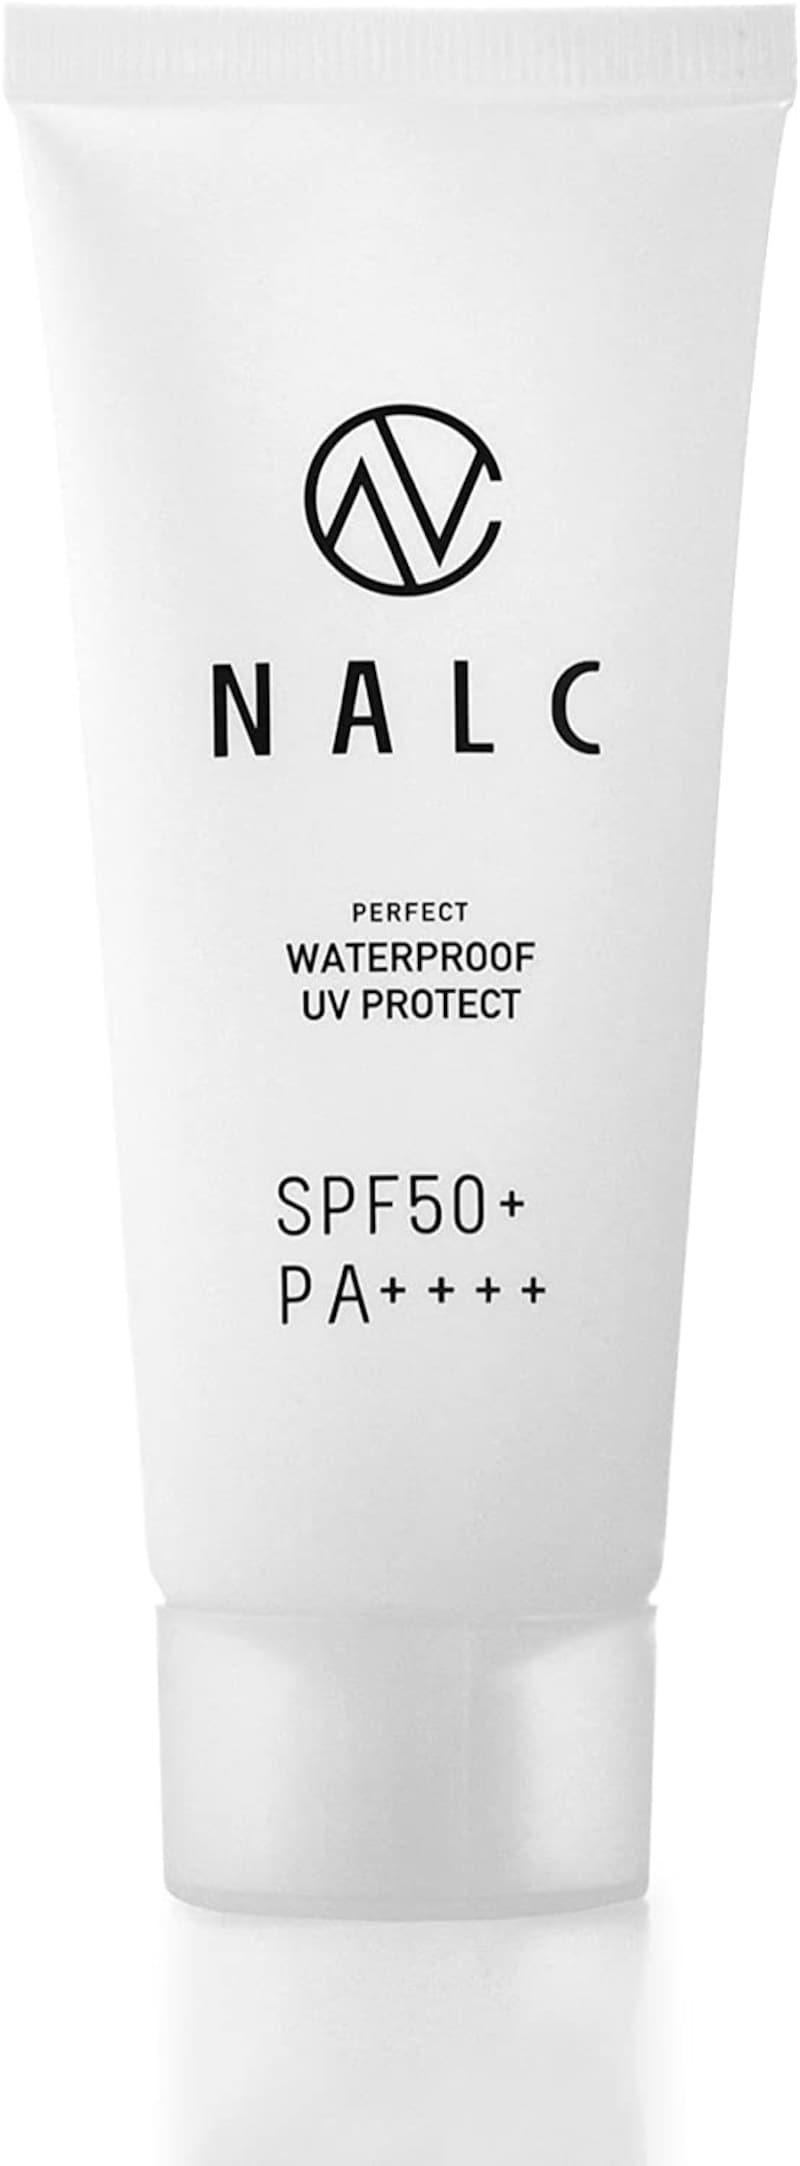 NALC,パーフェクトウォータープルーフ日焼け止め